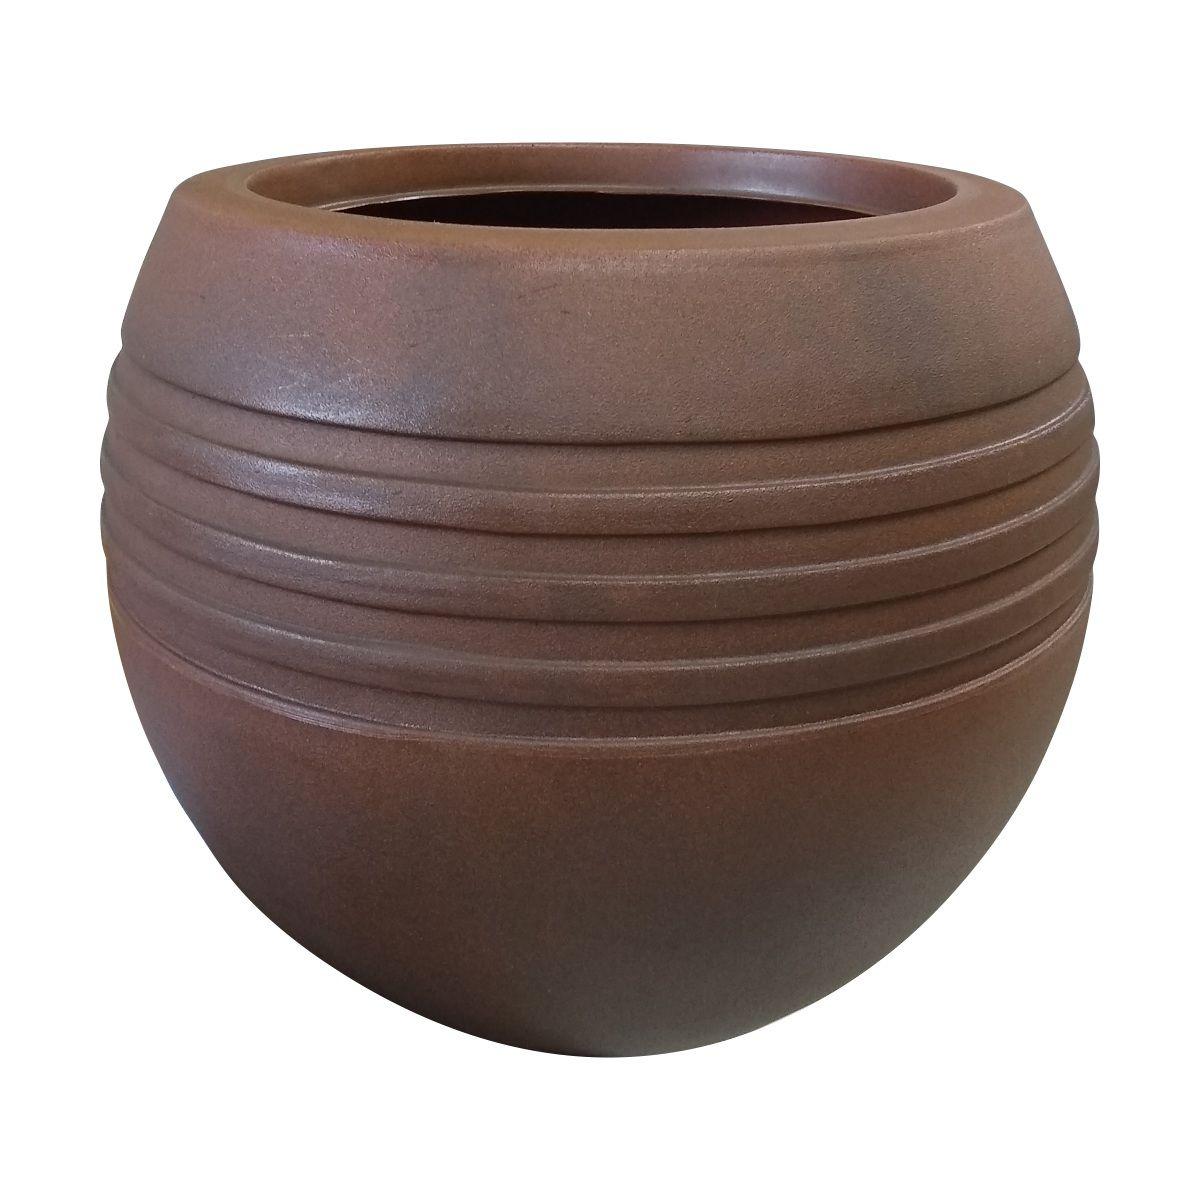 Vaso Oval Jateado Vogue cor Ferrugem 35cm x 30cm - OVP1-FE